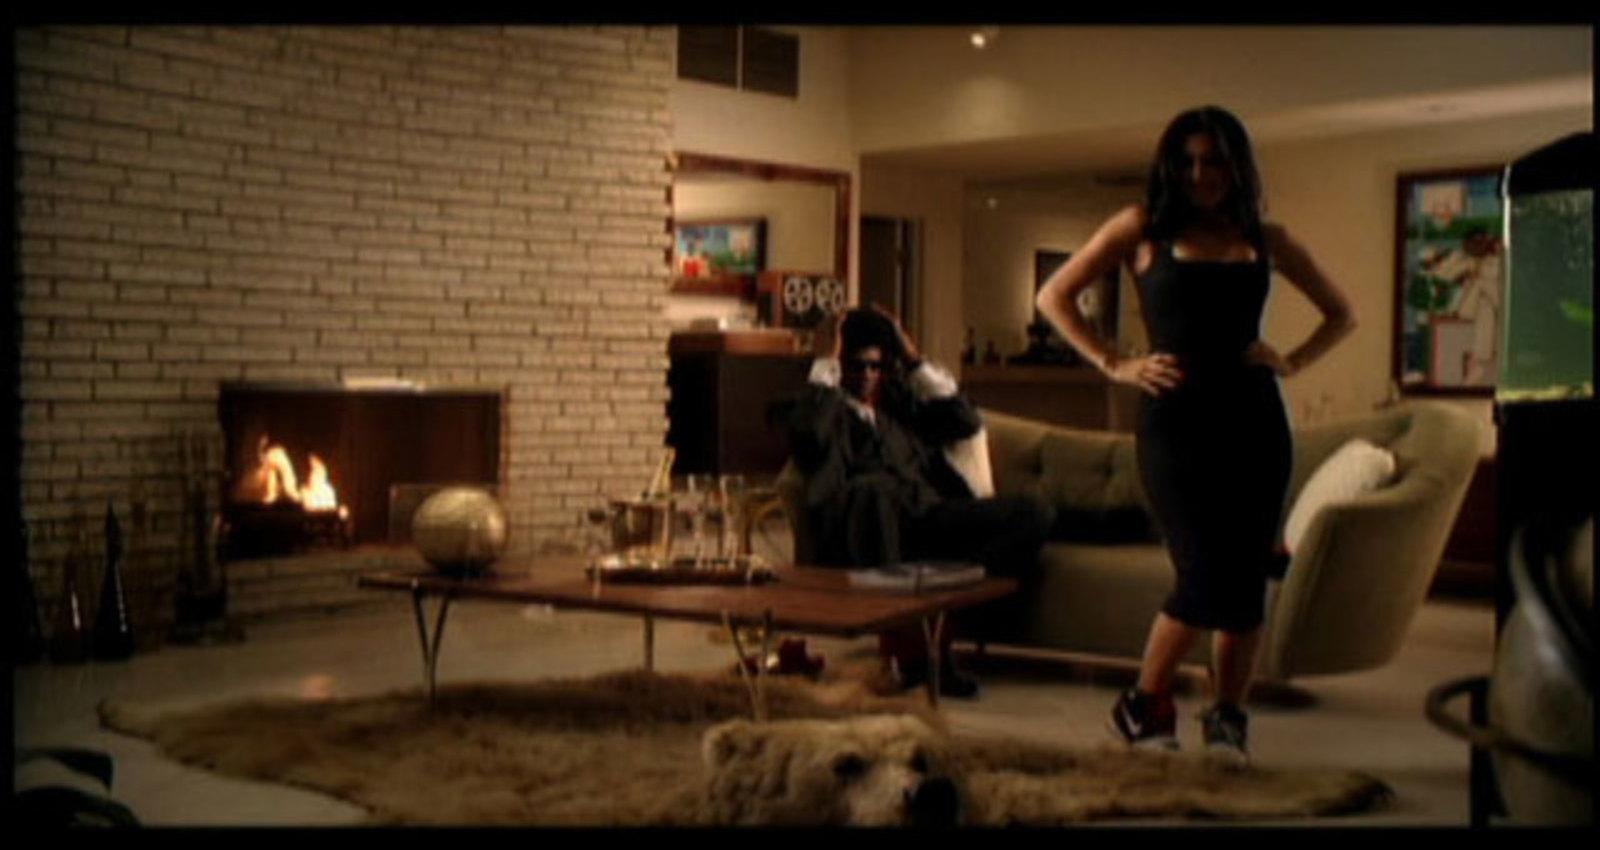 Business LeBron and Nicole Scherzinger